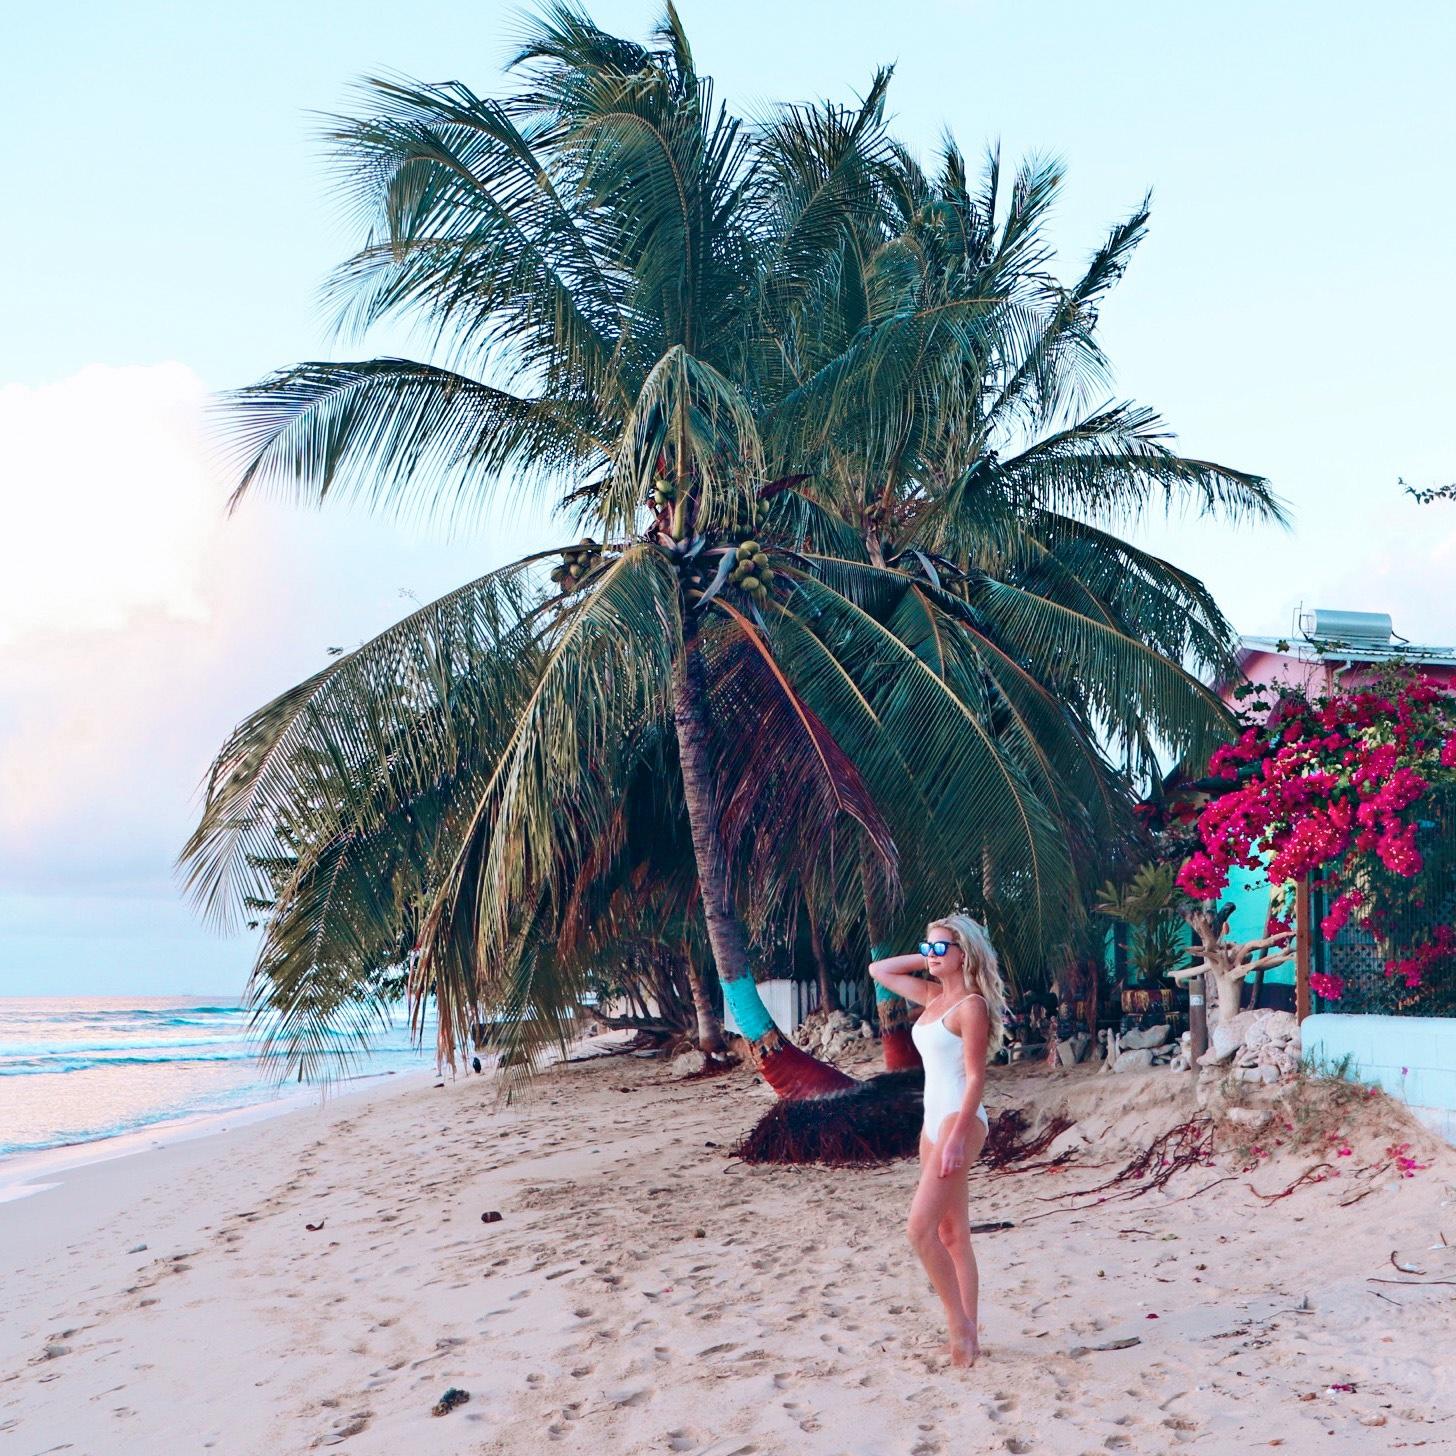 Barbados Travelguide Rese guide Corona Drömresan